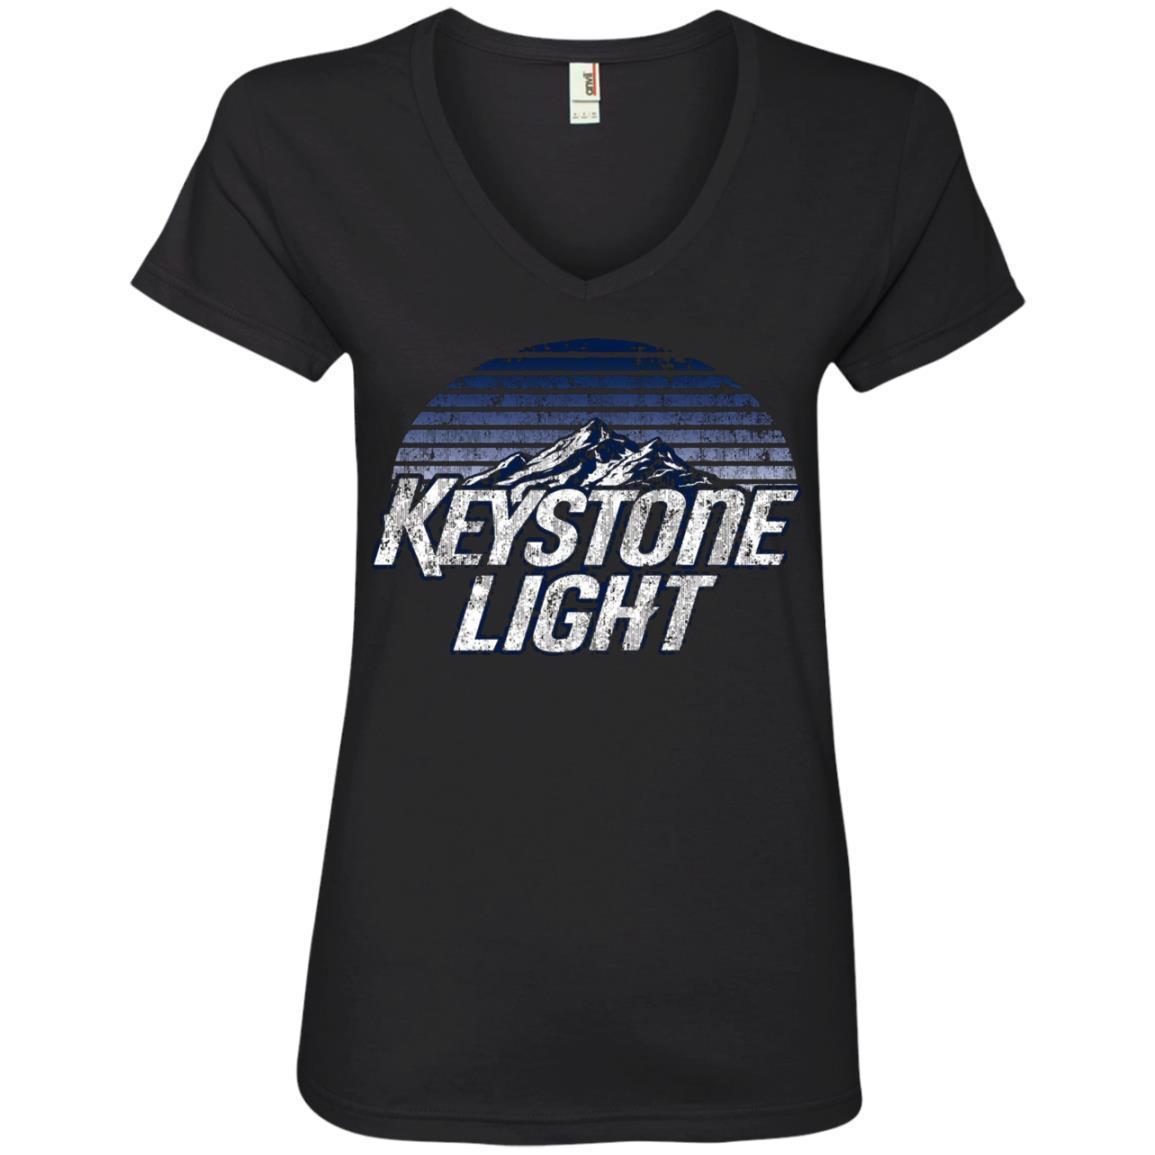 Keystone Light Beer Classic Look – Ladies' V-Neck T-Shirt